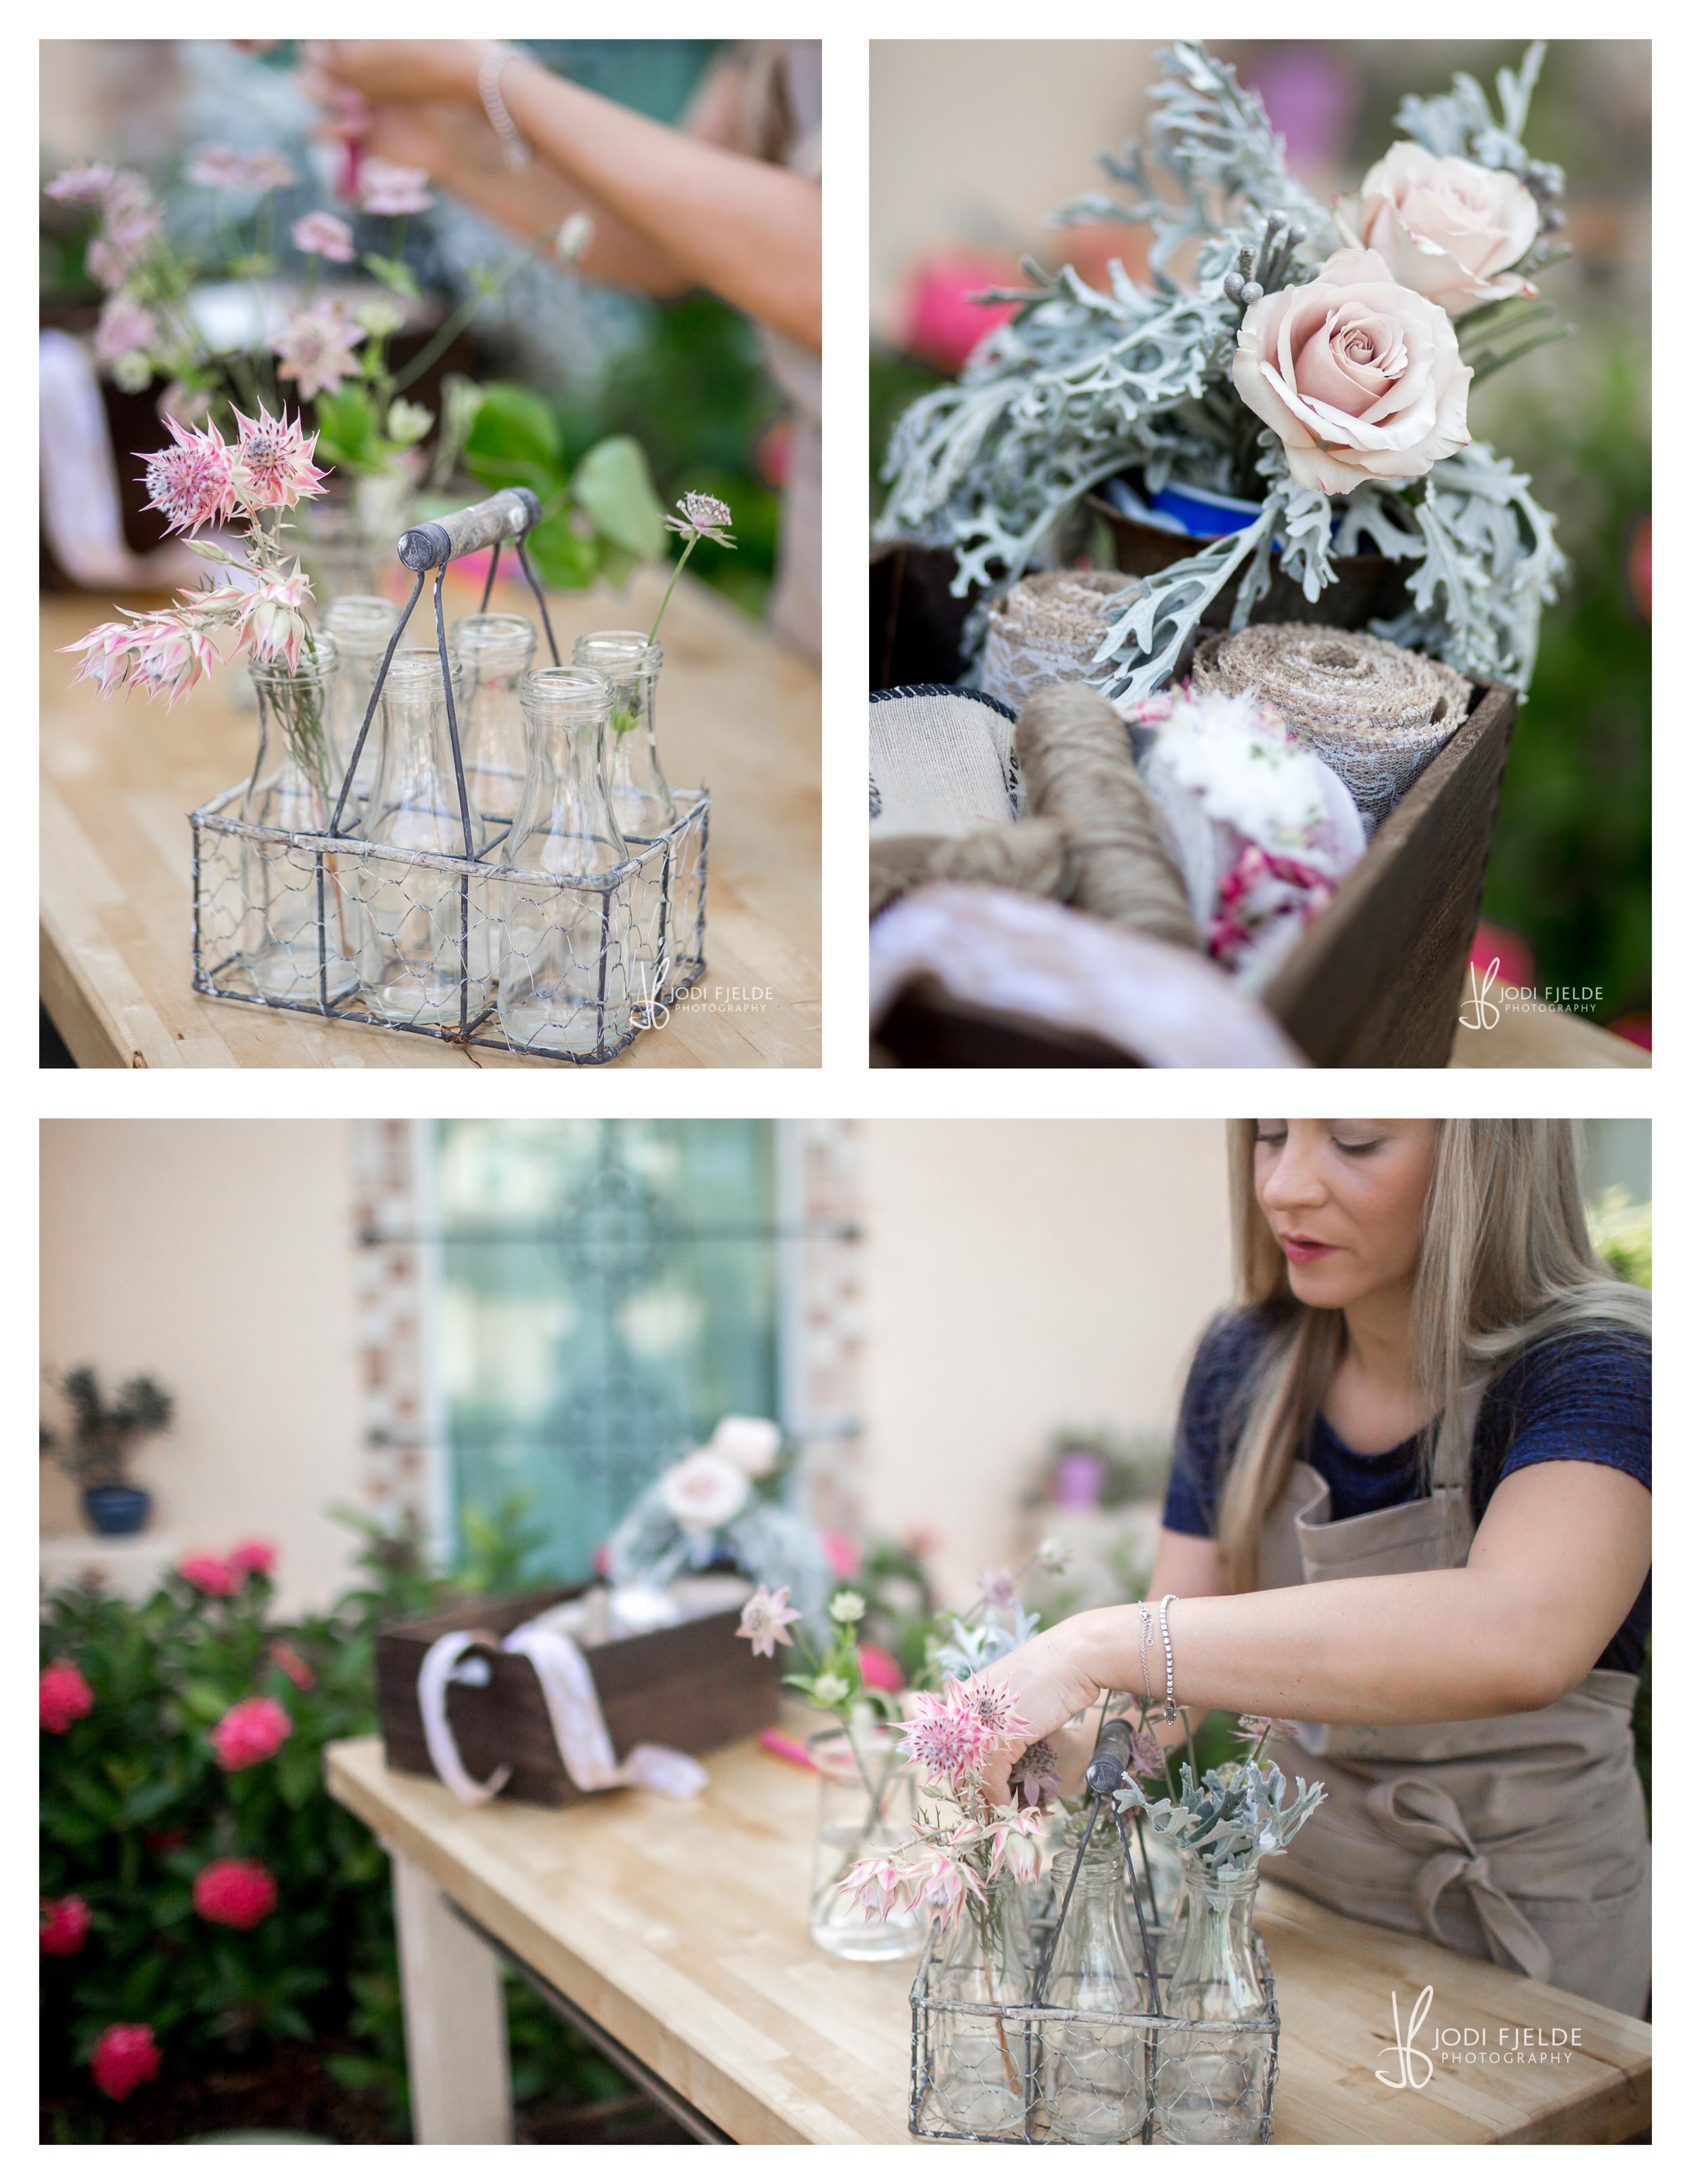 Parkland_Commercial_Business_Branding_Photography_Flowerly Studio_Jodi_Fjelde_Photogrpahy_3.jpg